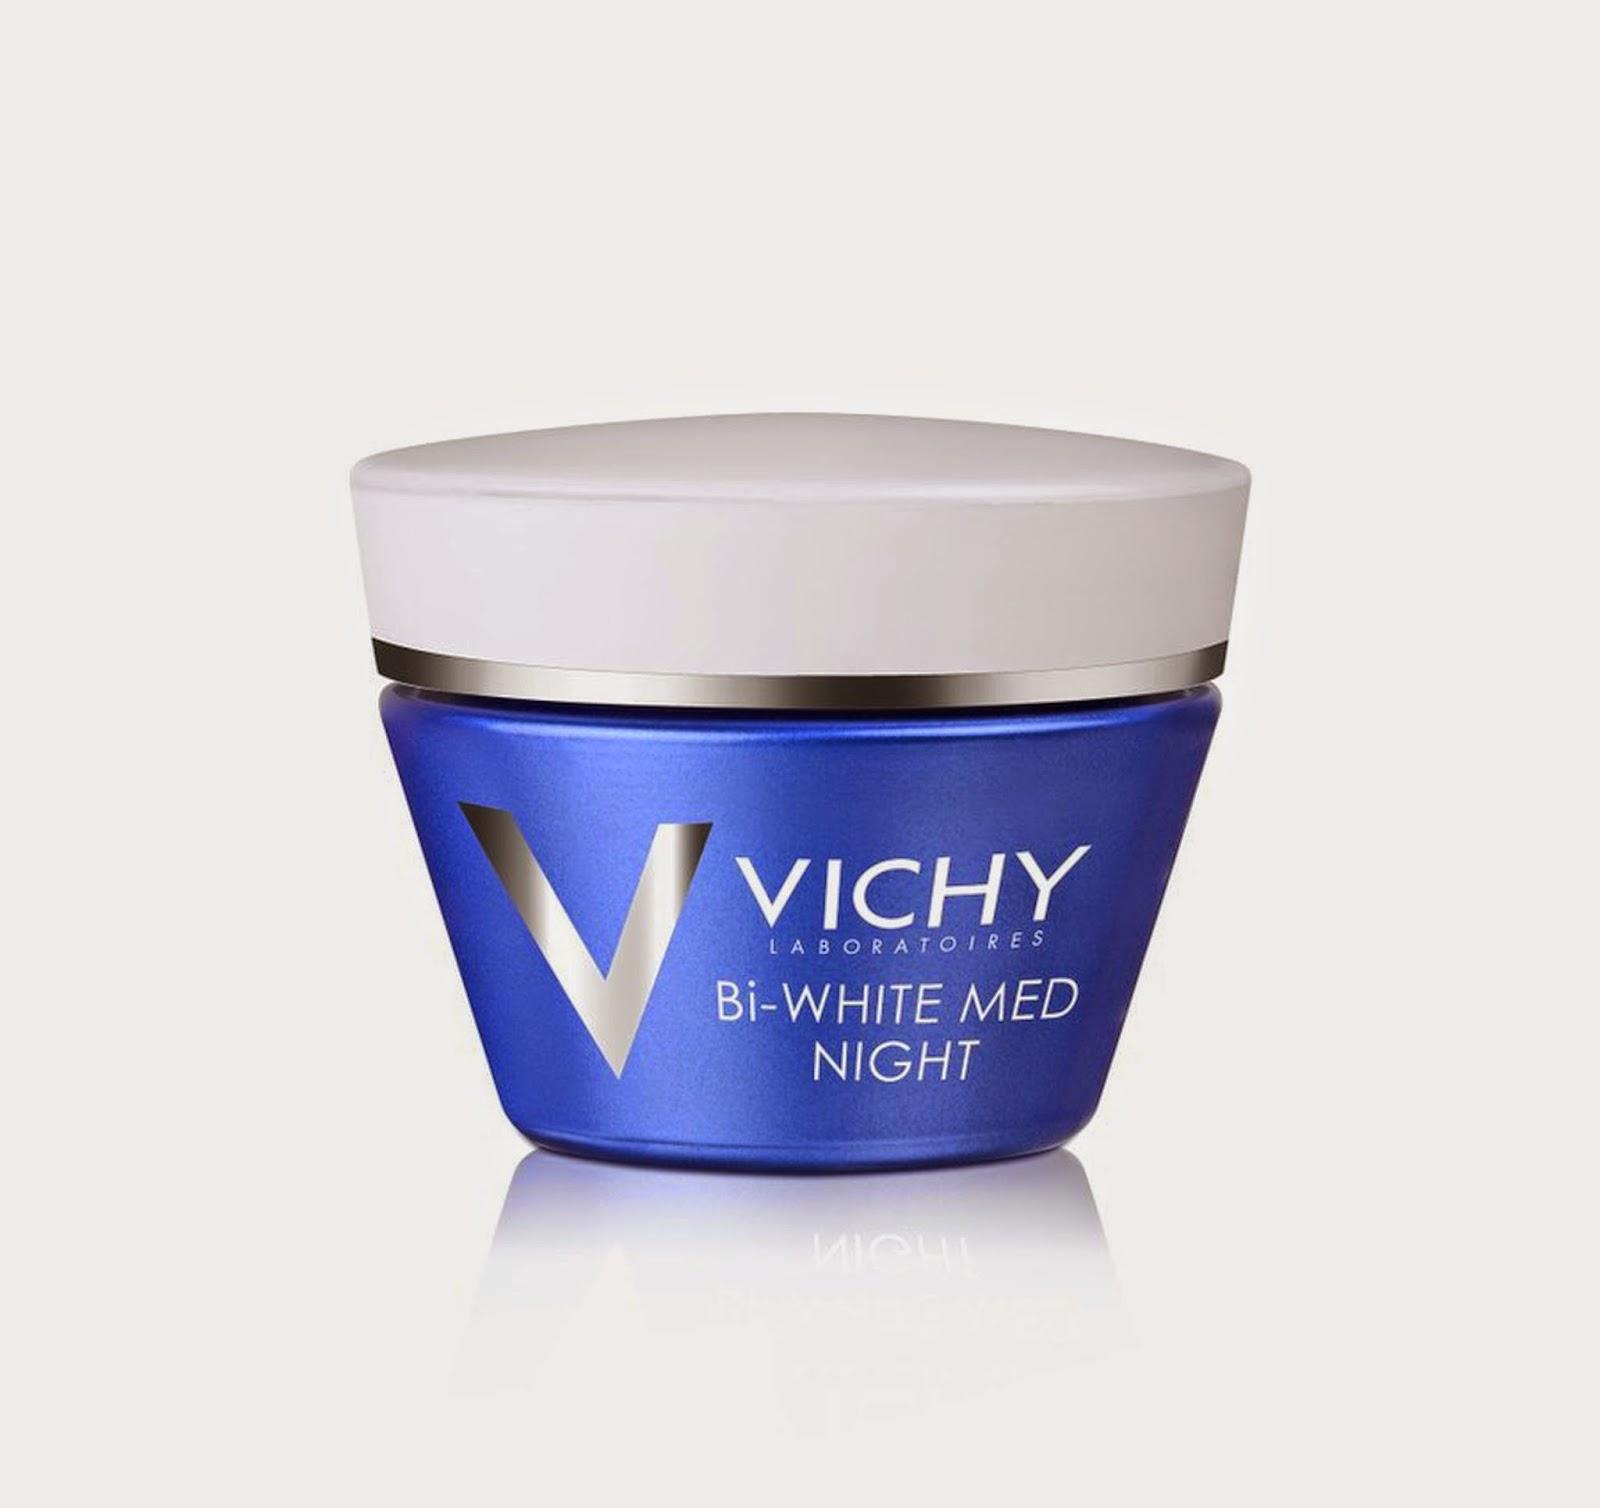 VICHY Bi-WHITE MED Night Cream